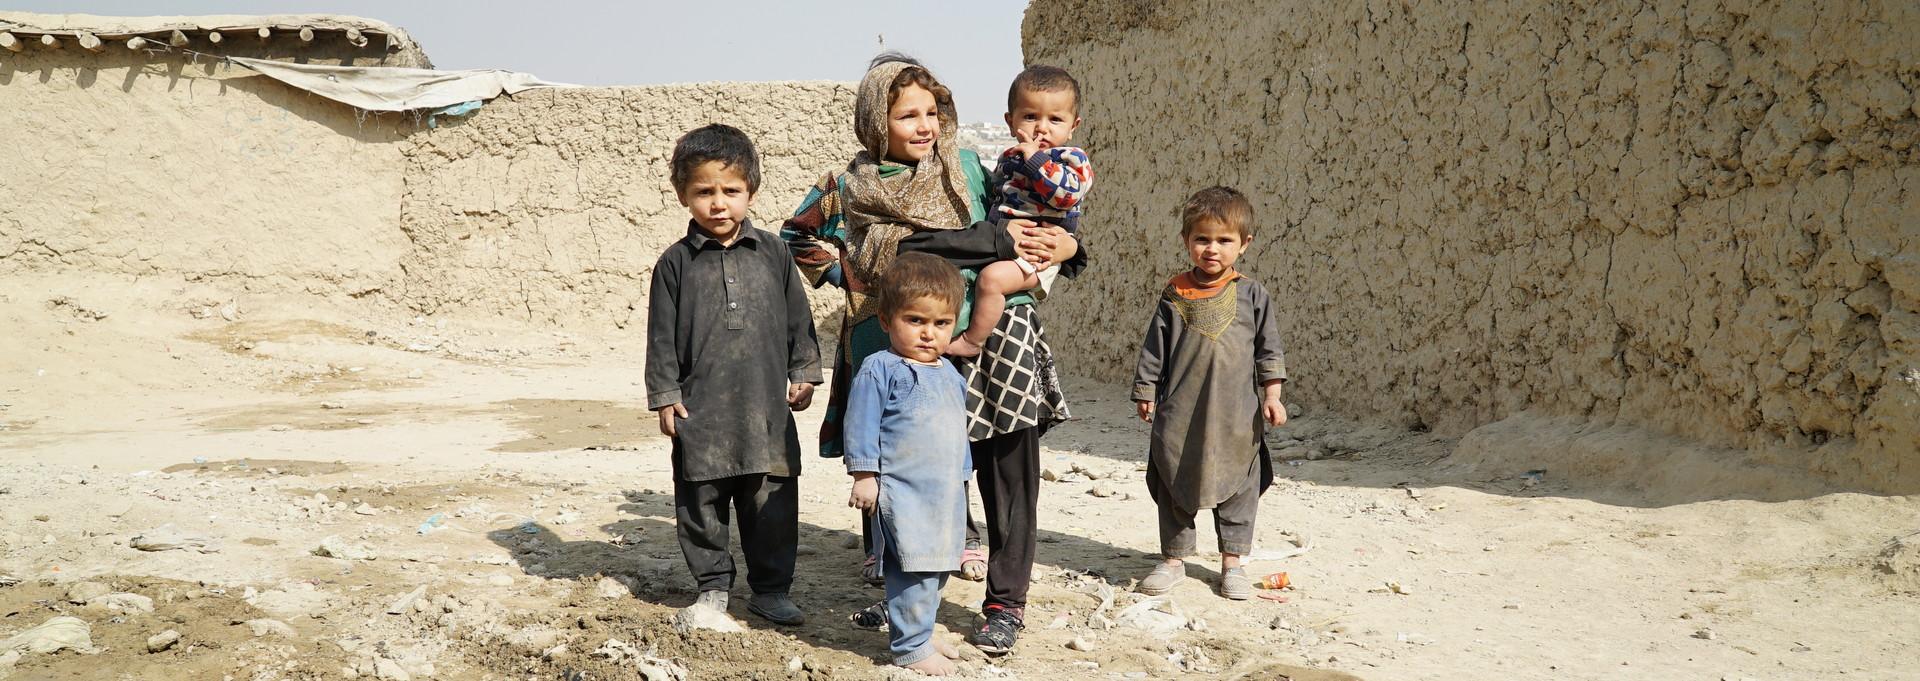 Afghanistans Children of War - The Atlantic